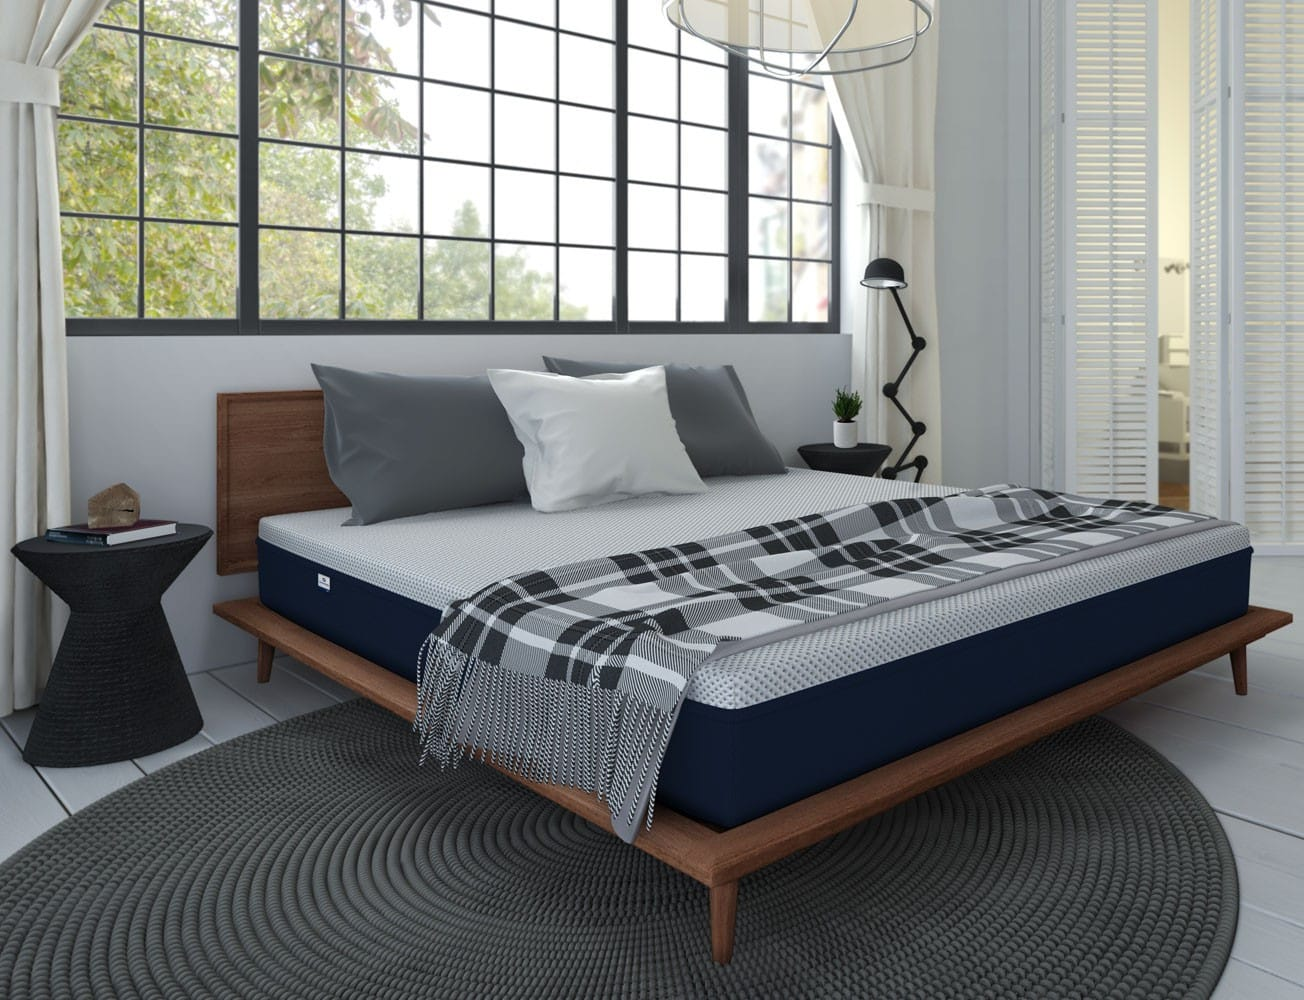 amerisleep as1 mattress